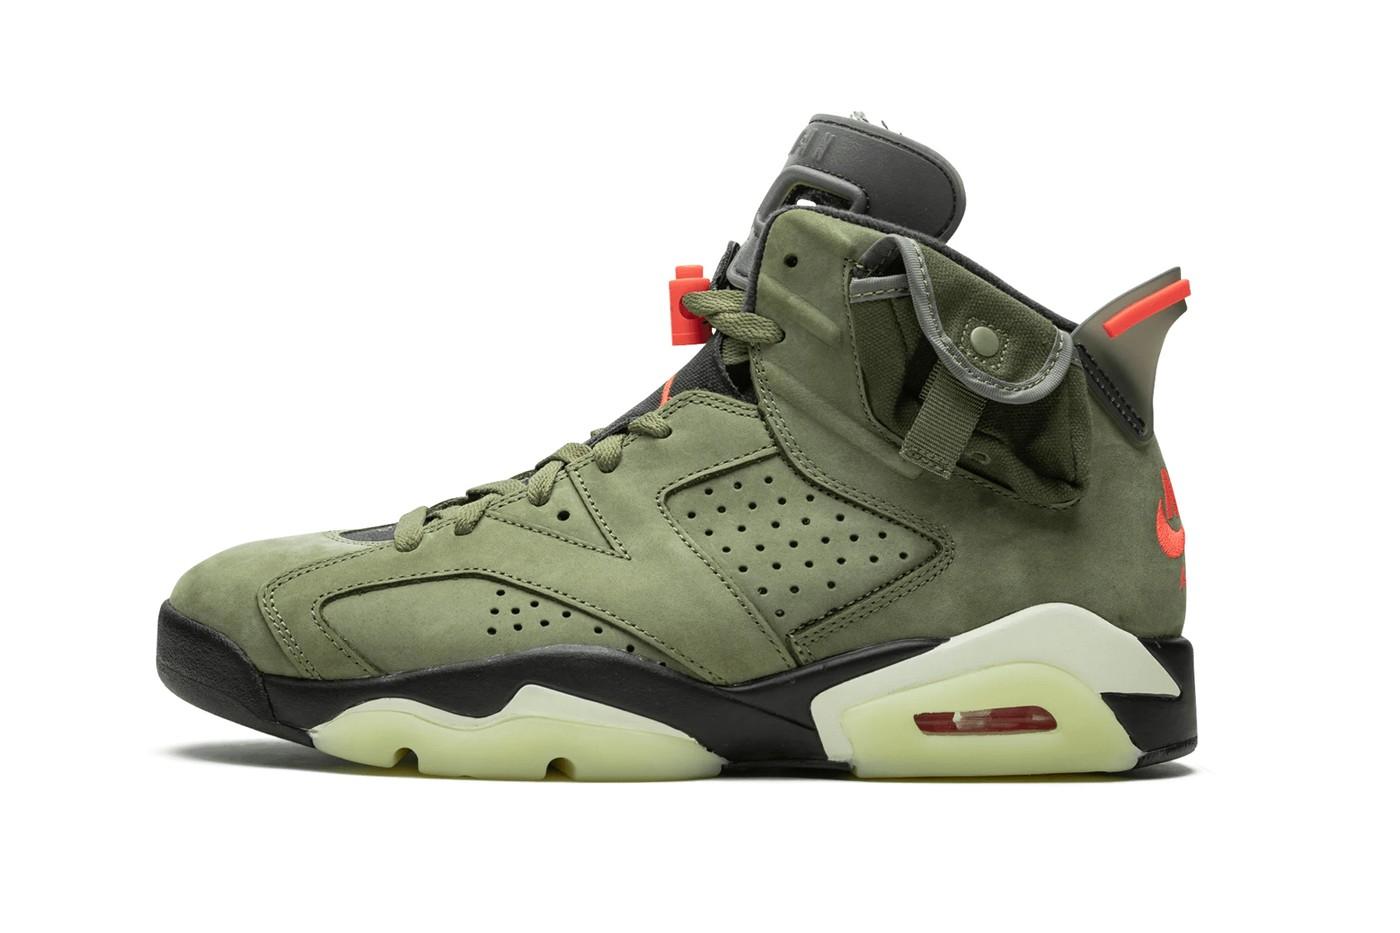 Travis Scott x Air Jordan 6「Cactus Jack」 联名鞋款正式贩售日期曝光